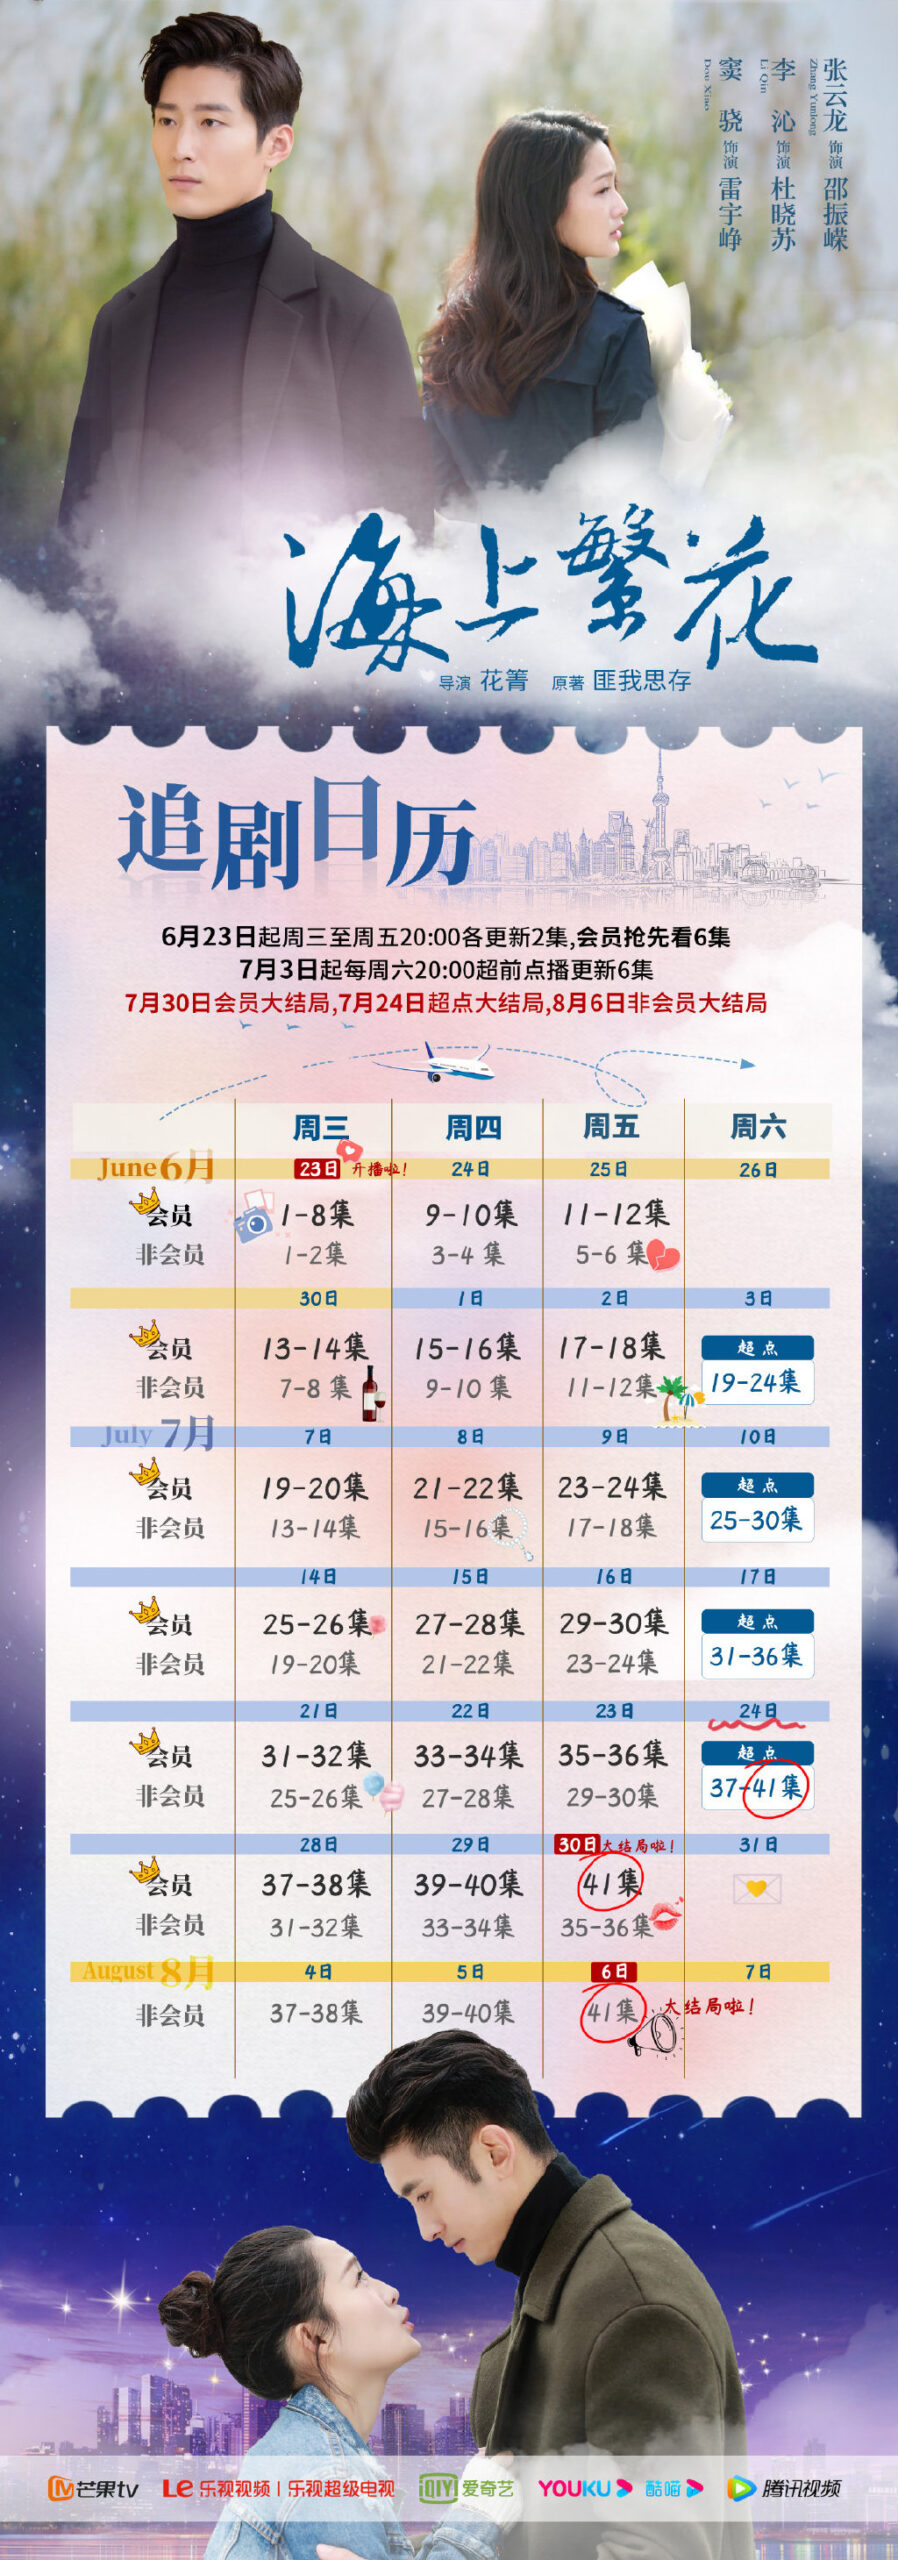 Tears In Heaven Chinese Drama Airing Calendar